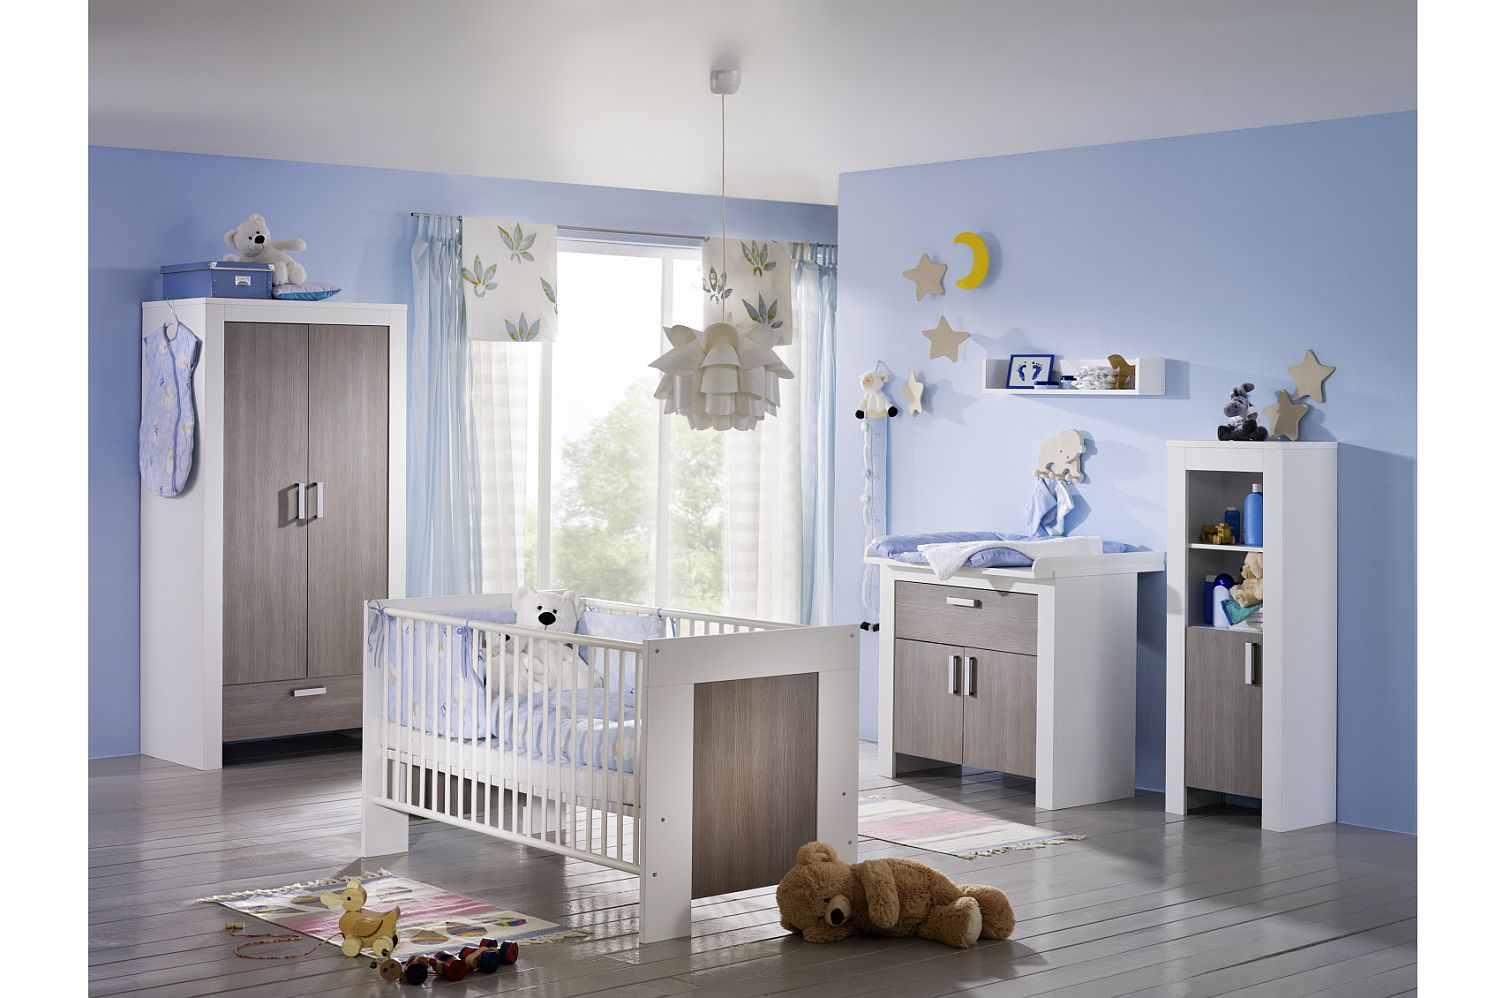 kinderzimmerset babyzimmer set komplett erstausstattung neu bett baby kommode ebay. Black Bedroom Furniture Sets. Home Design Ideas